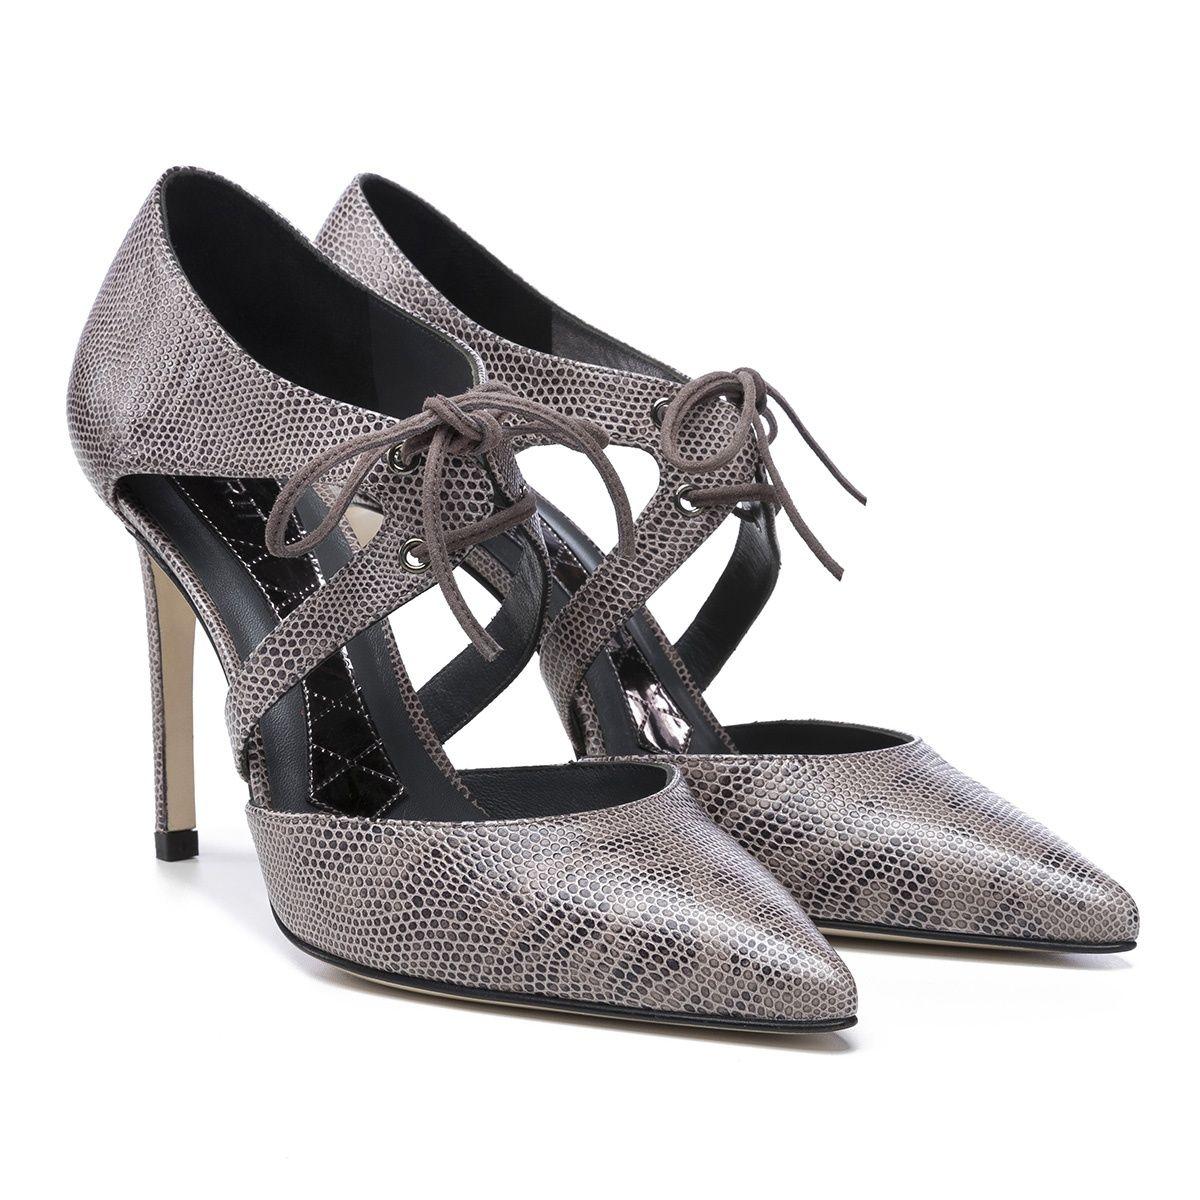 Cheap Sale Limited Edition Collections Online FOOTWEAR - Lace-up shoes Magrit Sale Largest Supplier X0cWx8cj